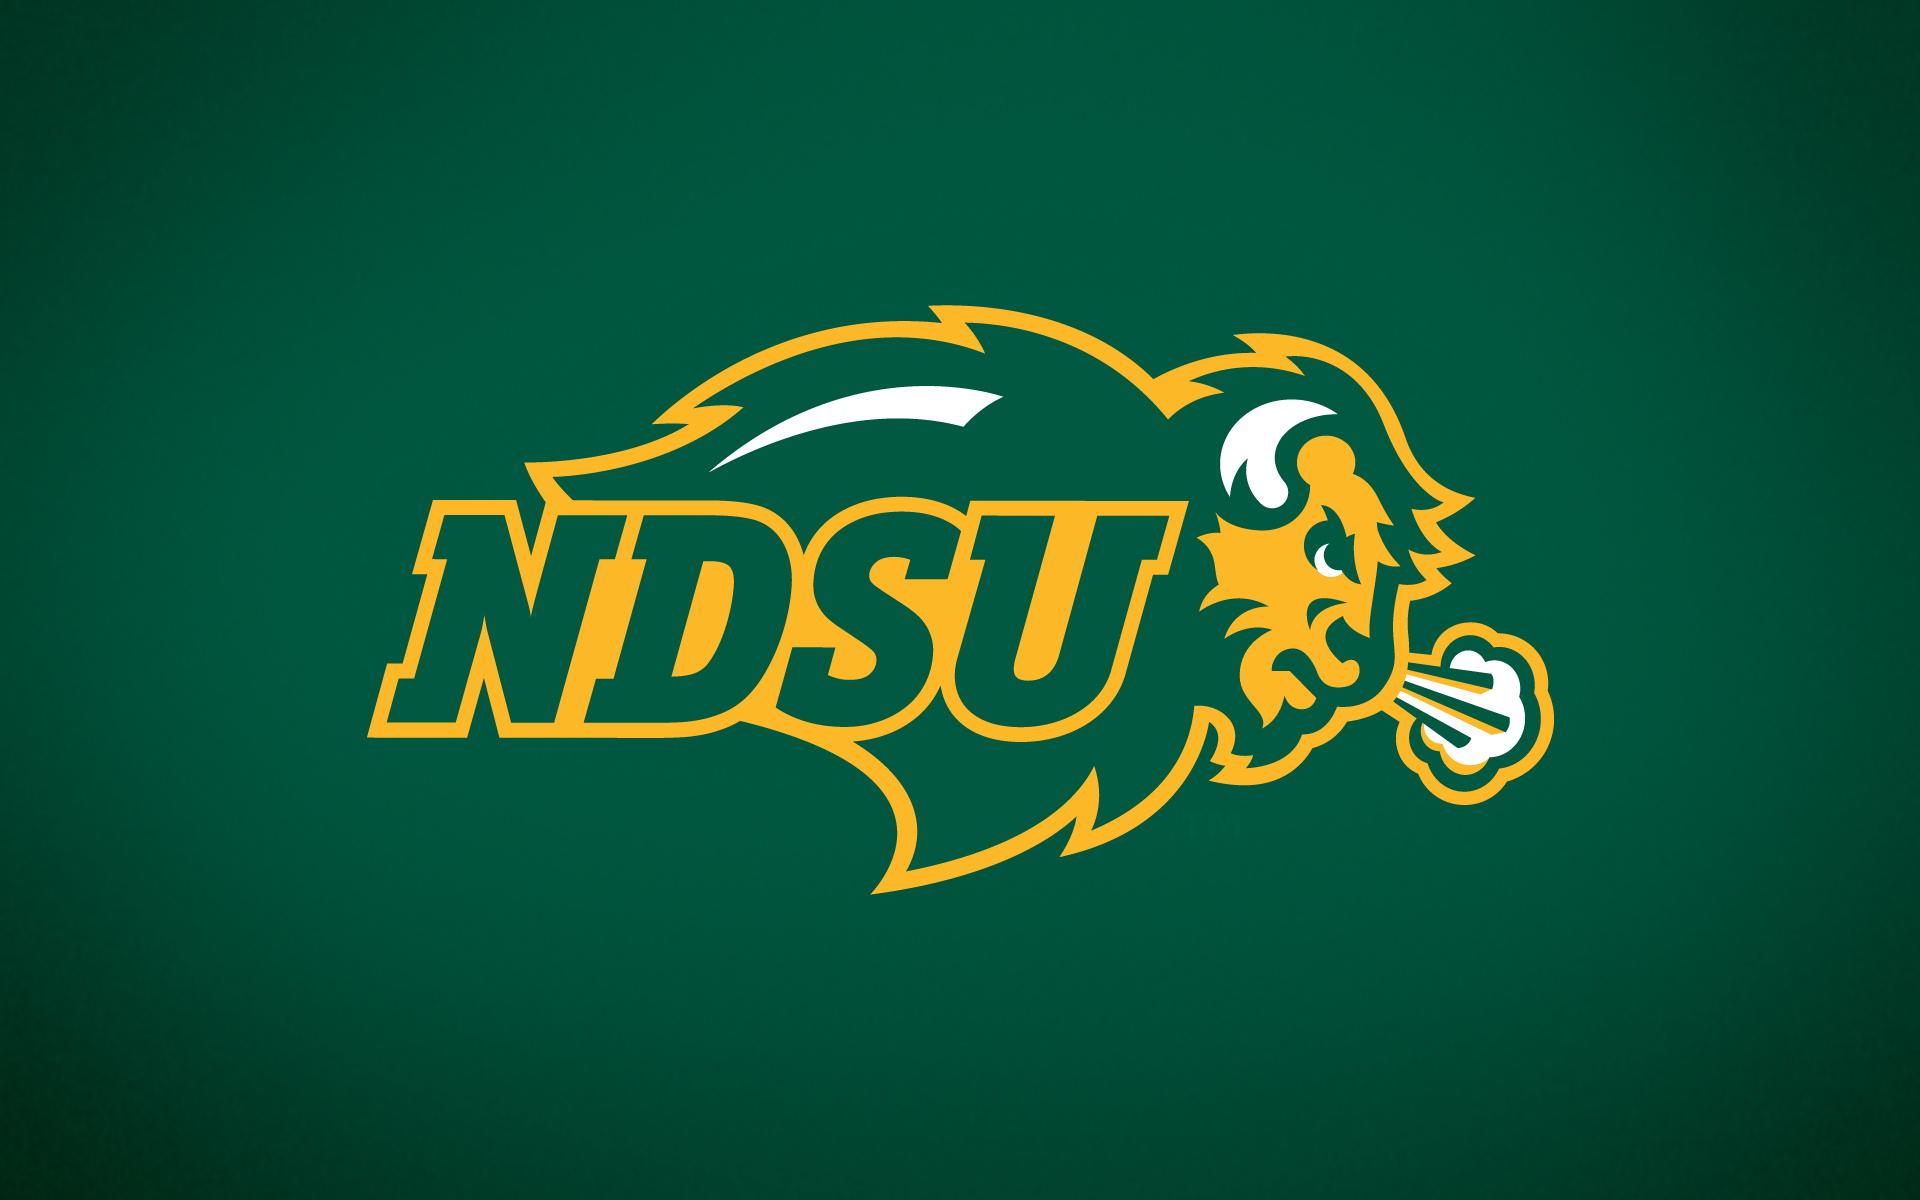 Ndsu Calendar 2022.North Dakota State University Release Enrollment Numbers For Fall 2020